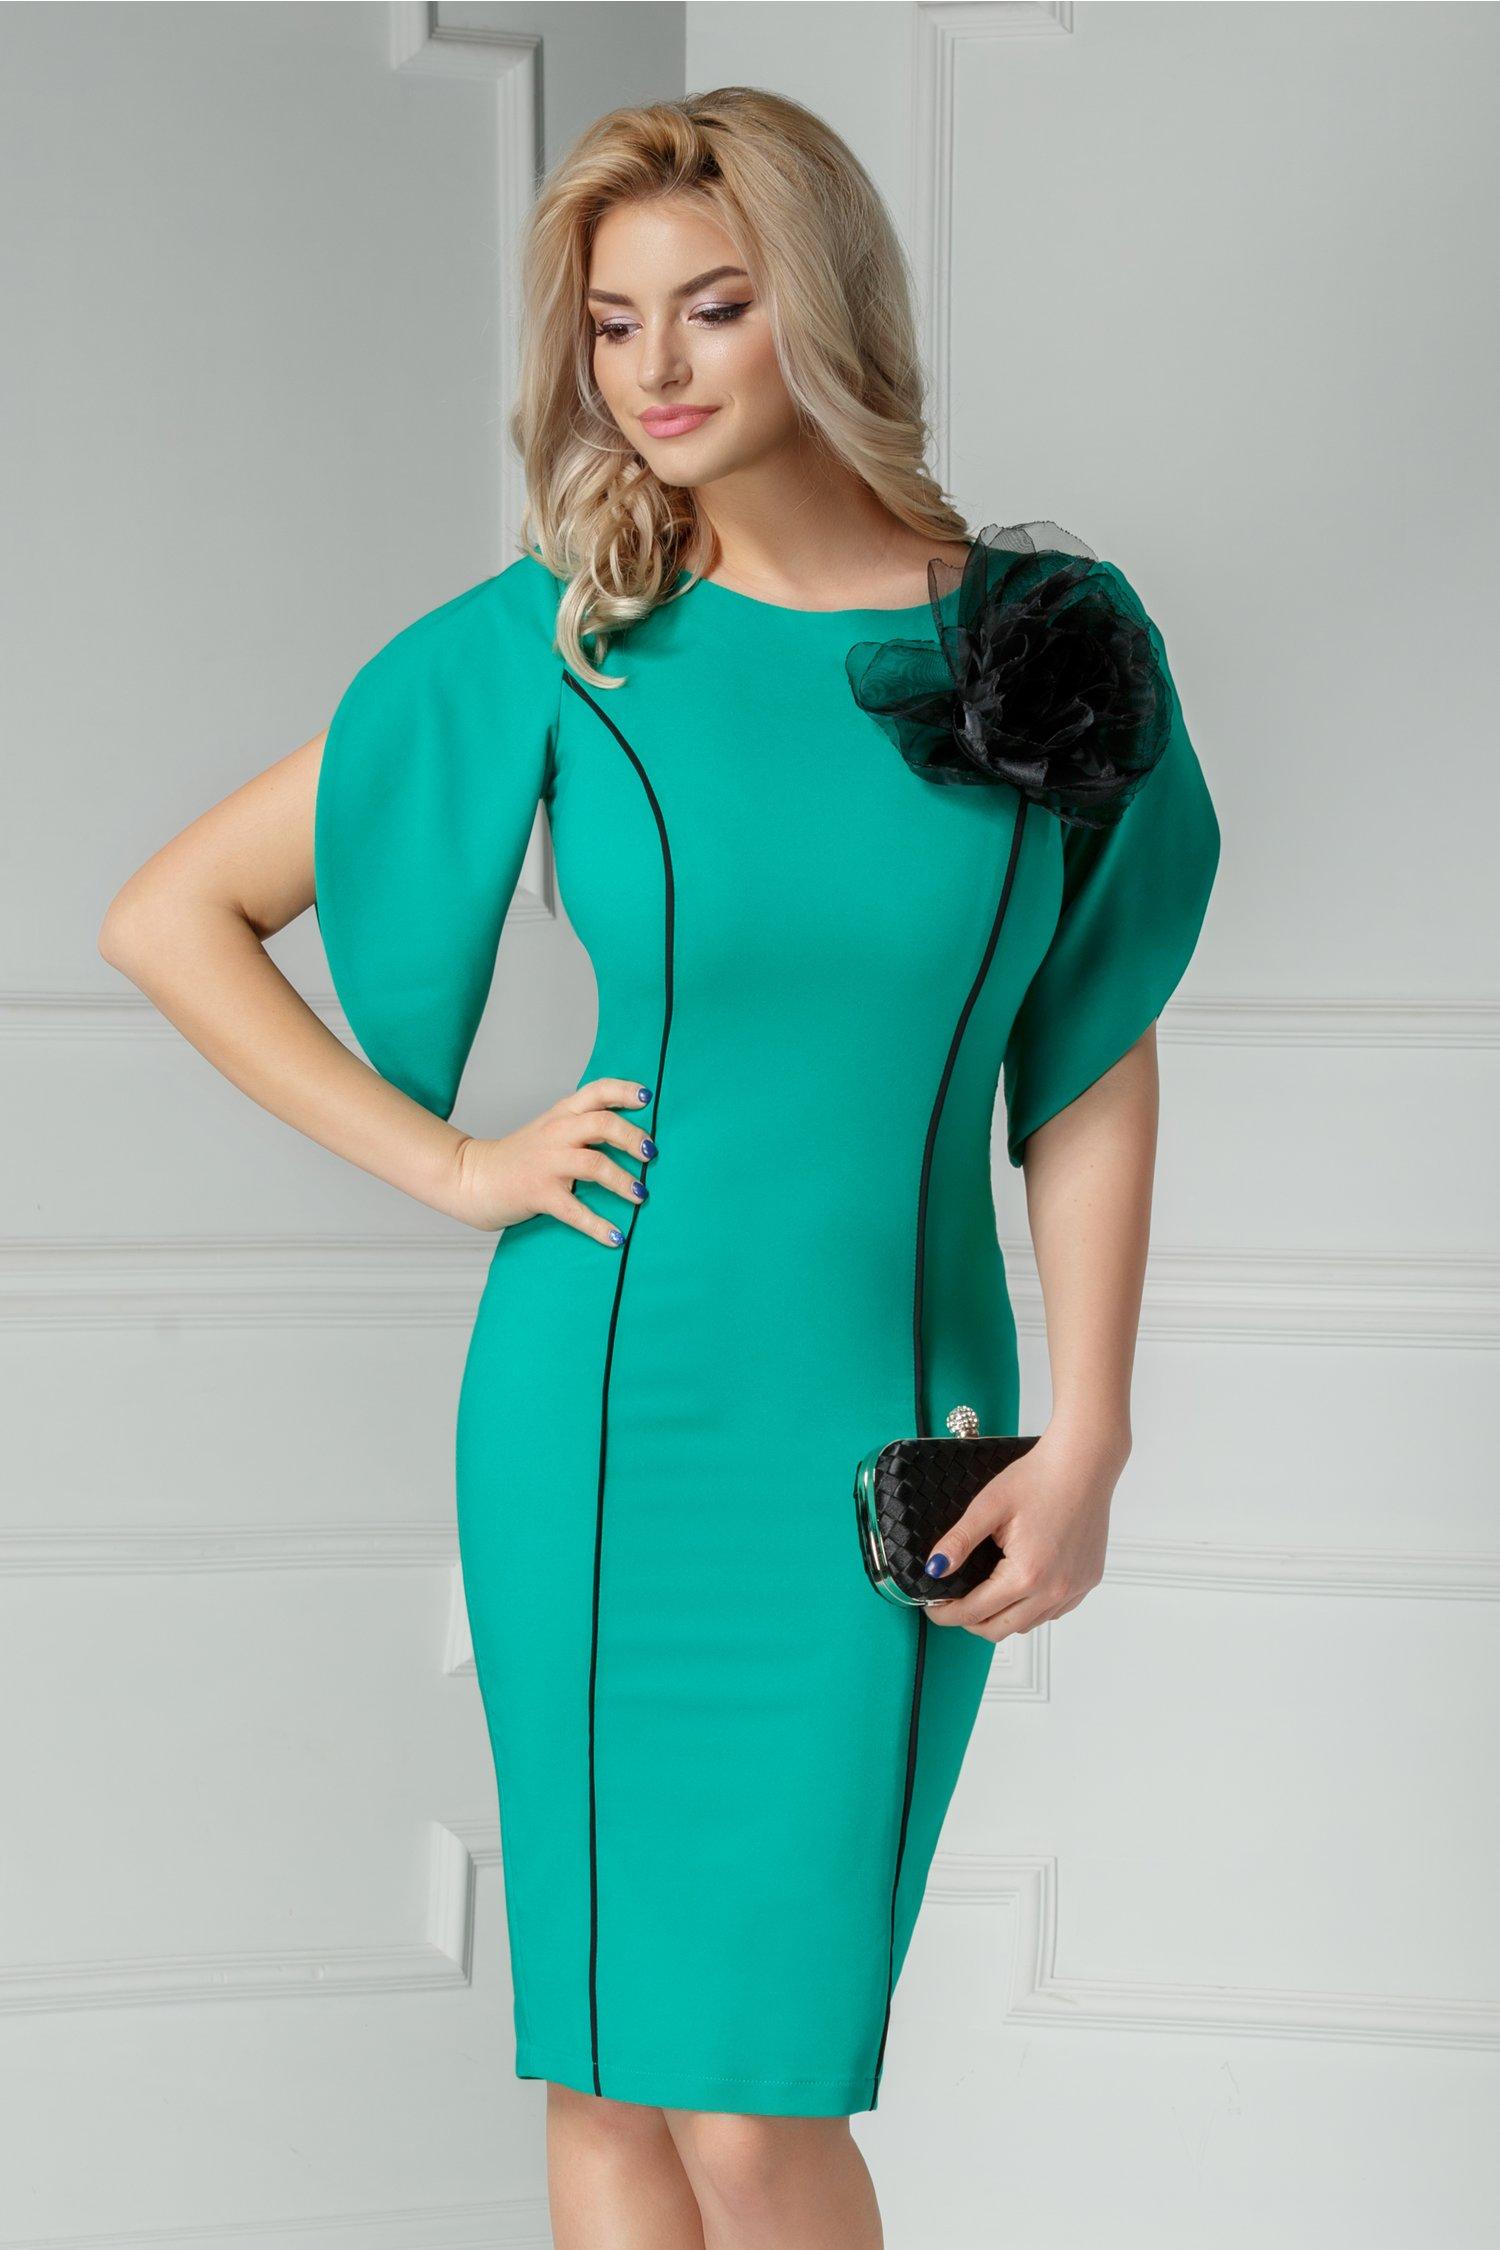 Rochie Amaro verde de ocazie cu dungi si brosa